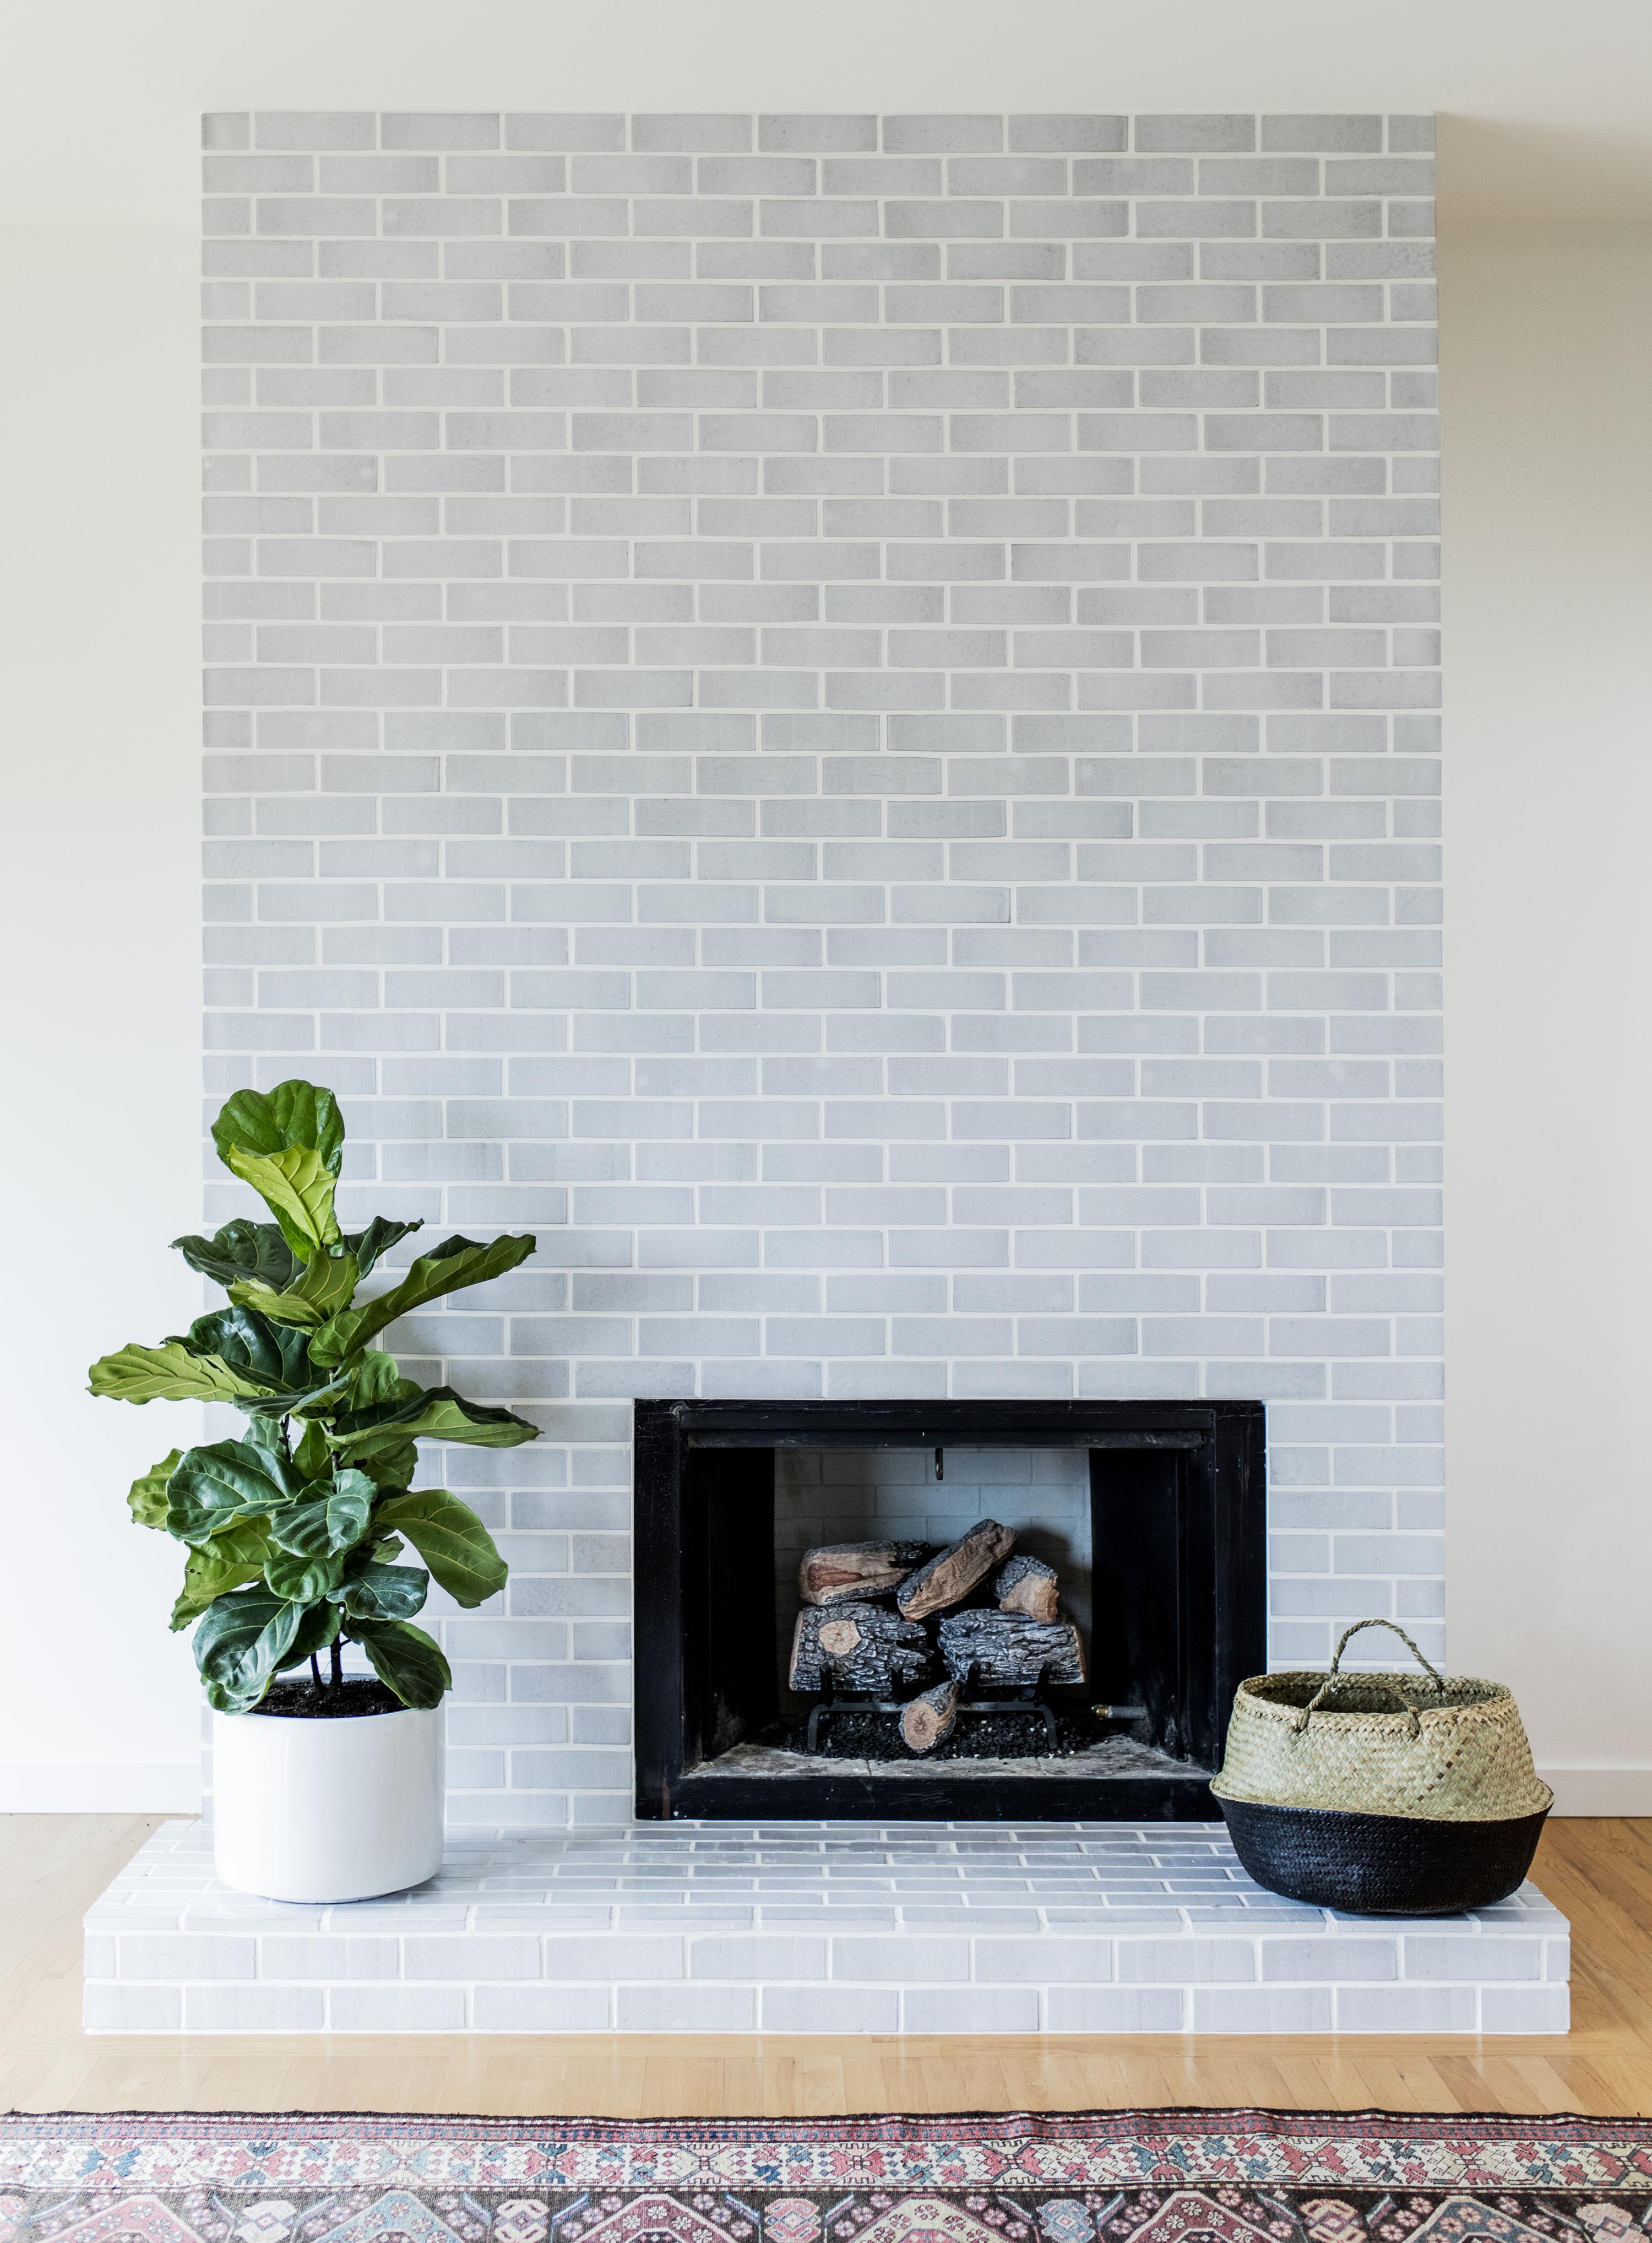 Q1_2017_Image_residential_Kristen_Pena_fireplace_brick_cotton.jpg